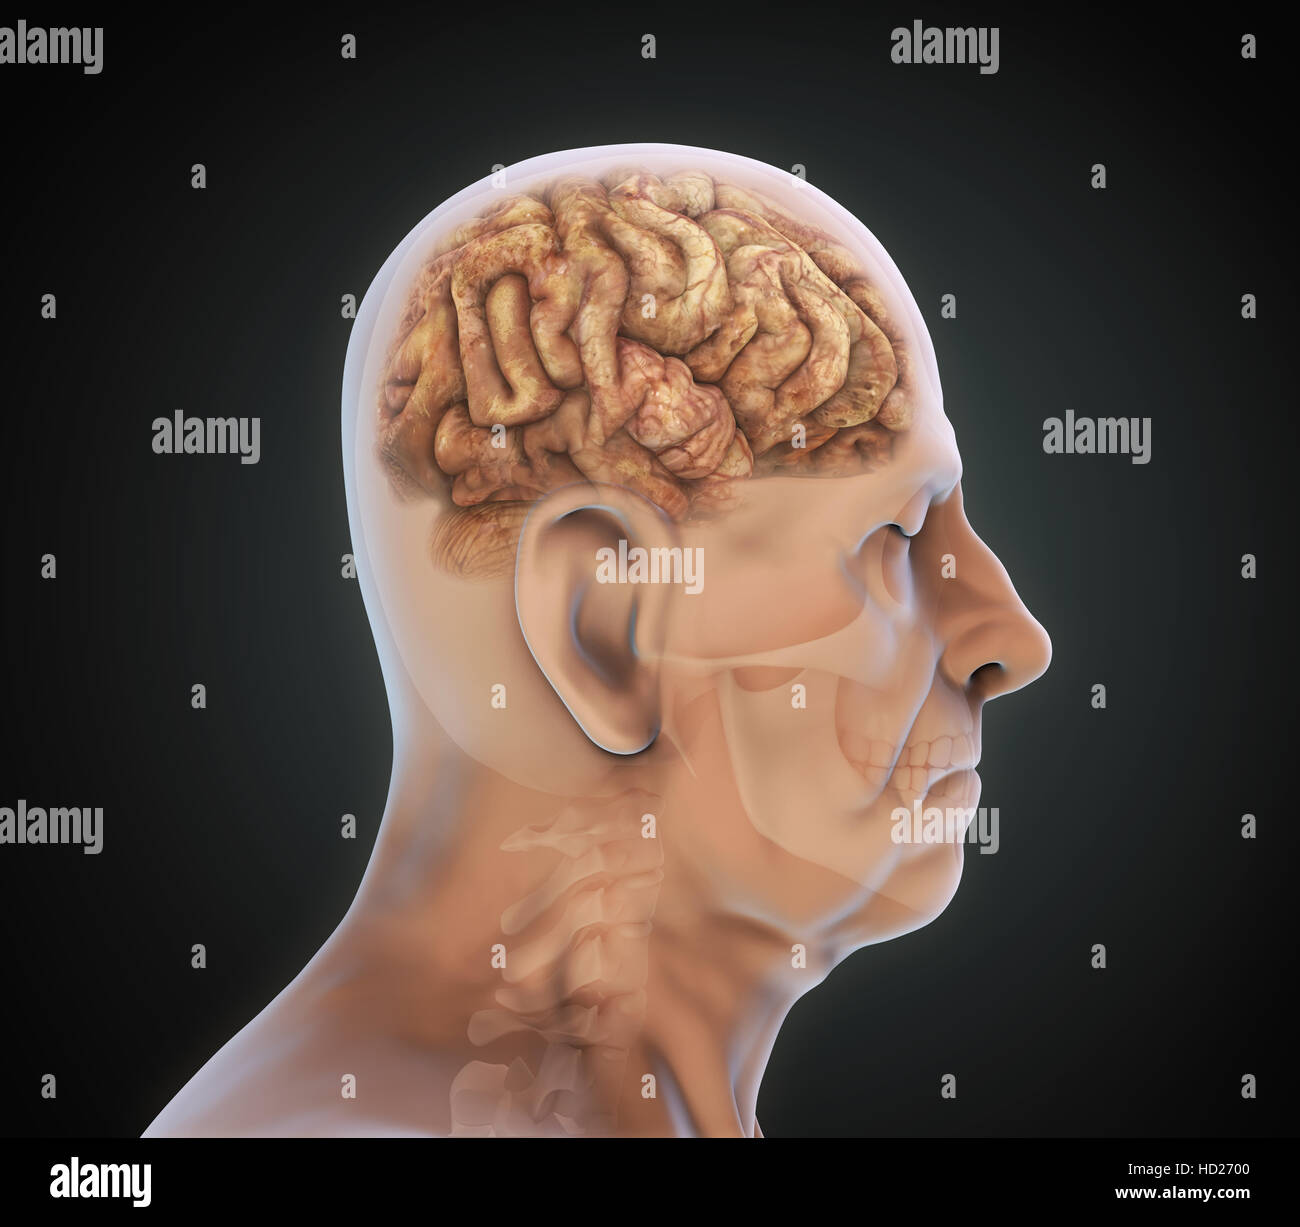 Brain Tumor Stockfotos & Brain Tumor Bilder - Alamy